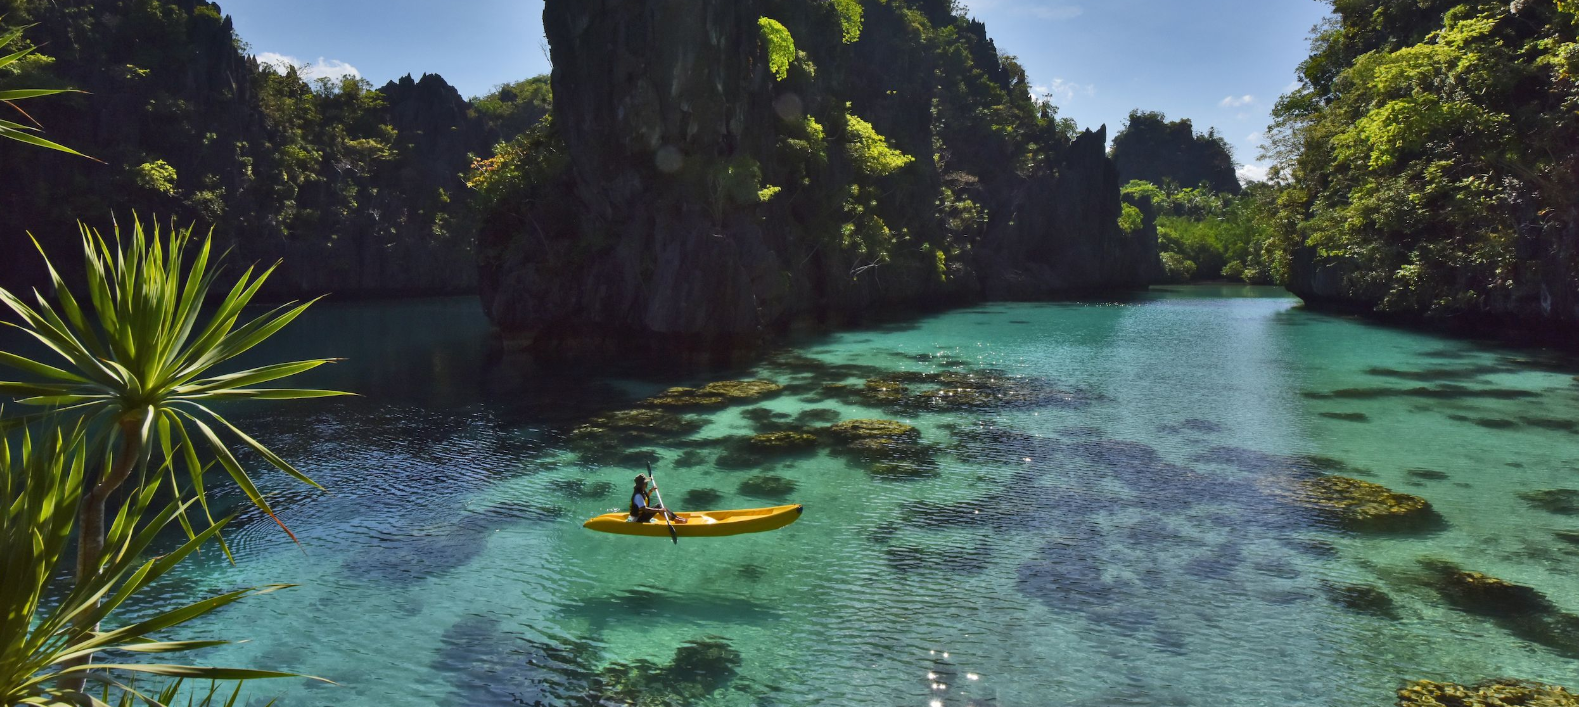 5 Reasons Why You Should Make Pangulasian Island Your Next Resort Getaway